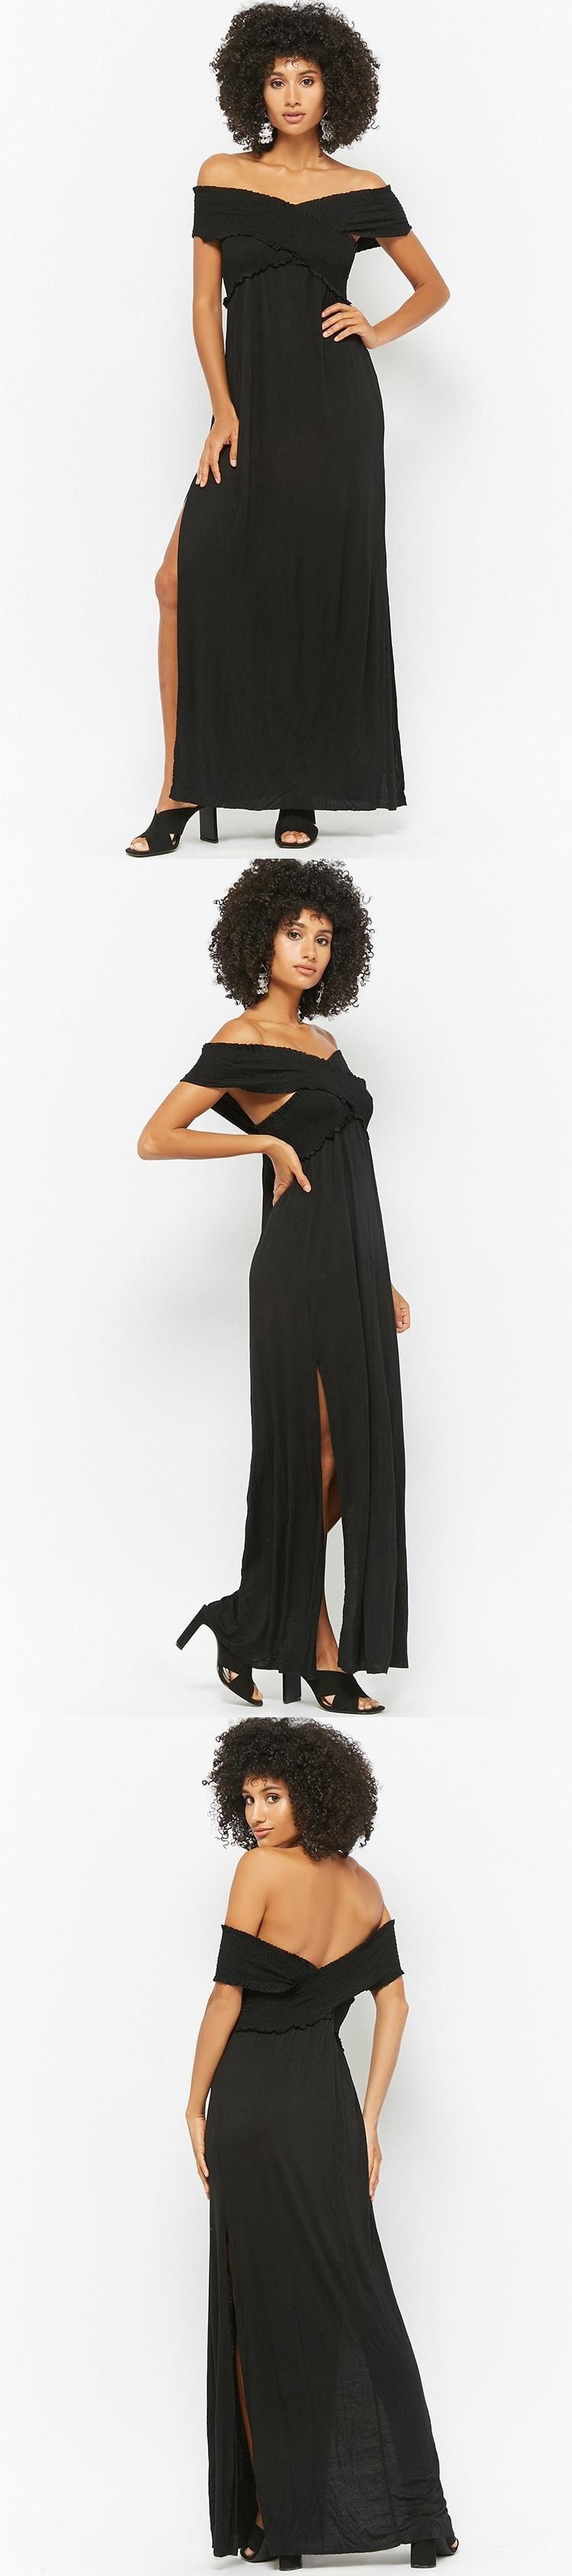 Smocked offtheshoulder maxi dress usd forever new